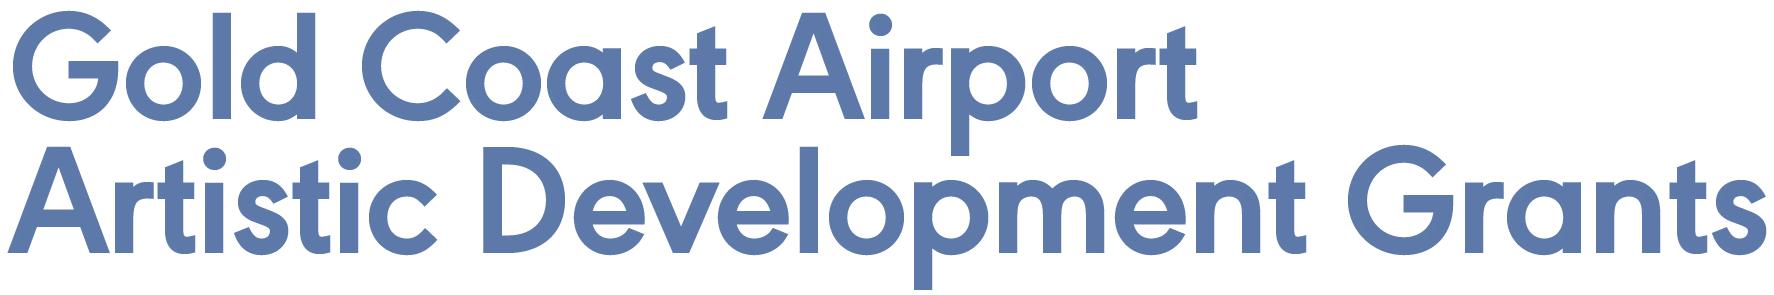 Gold Coast Airport Artistic Development Grants